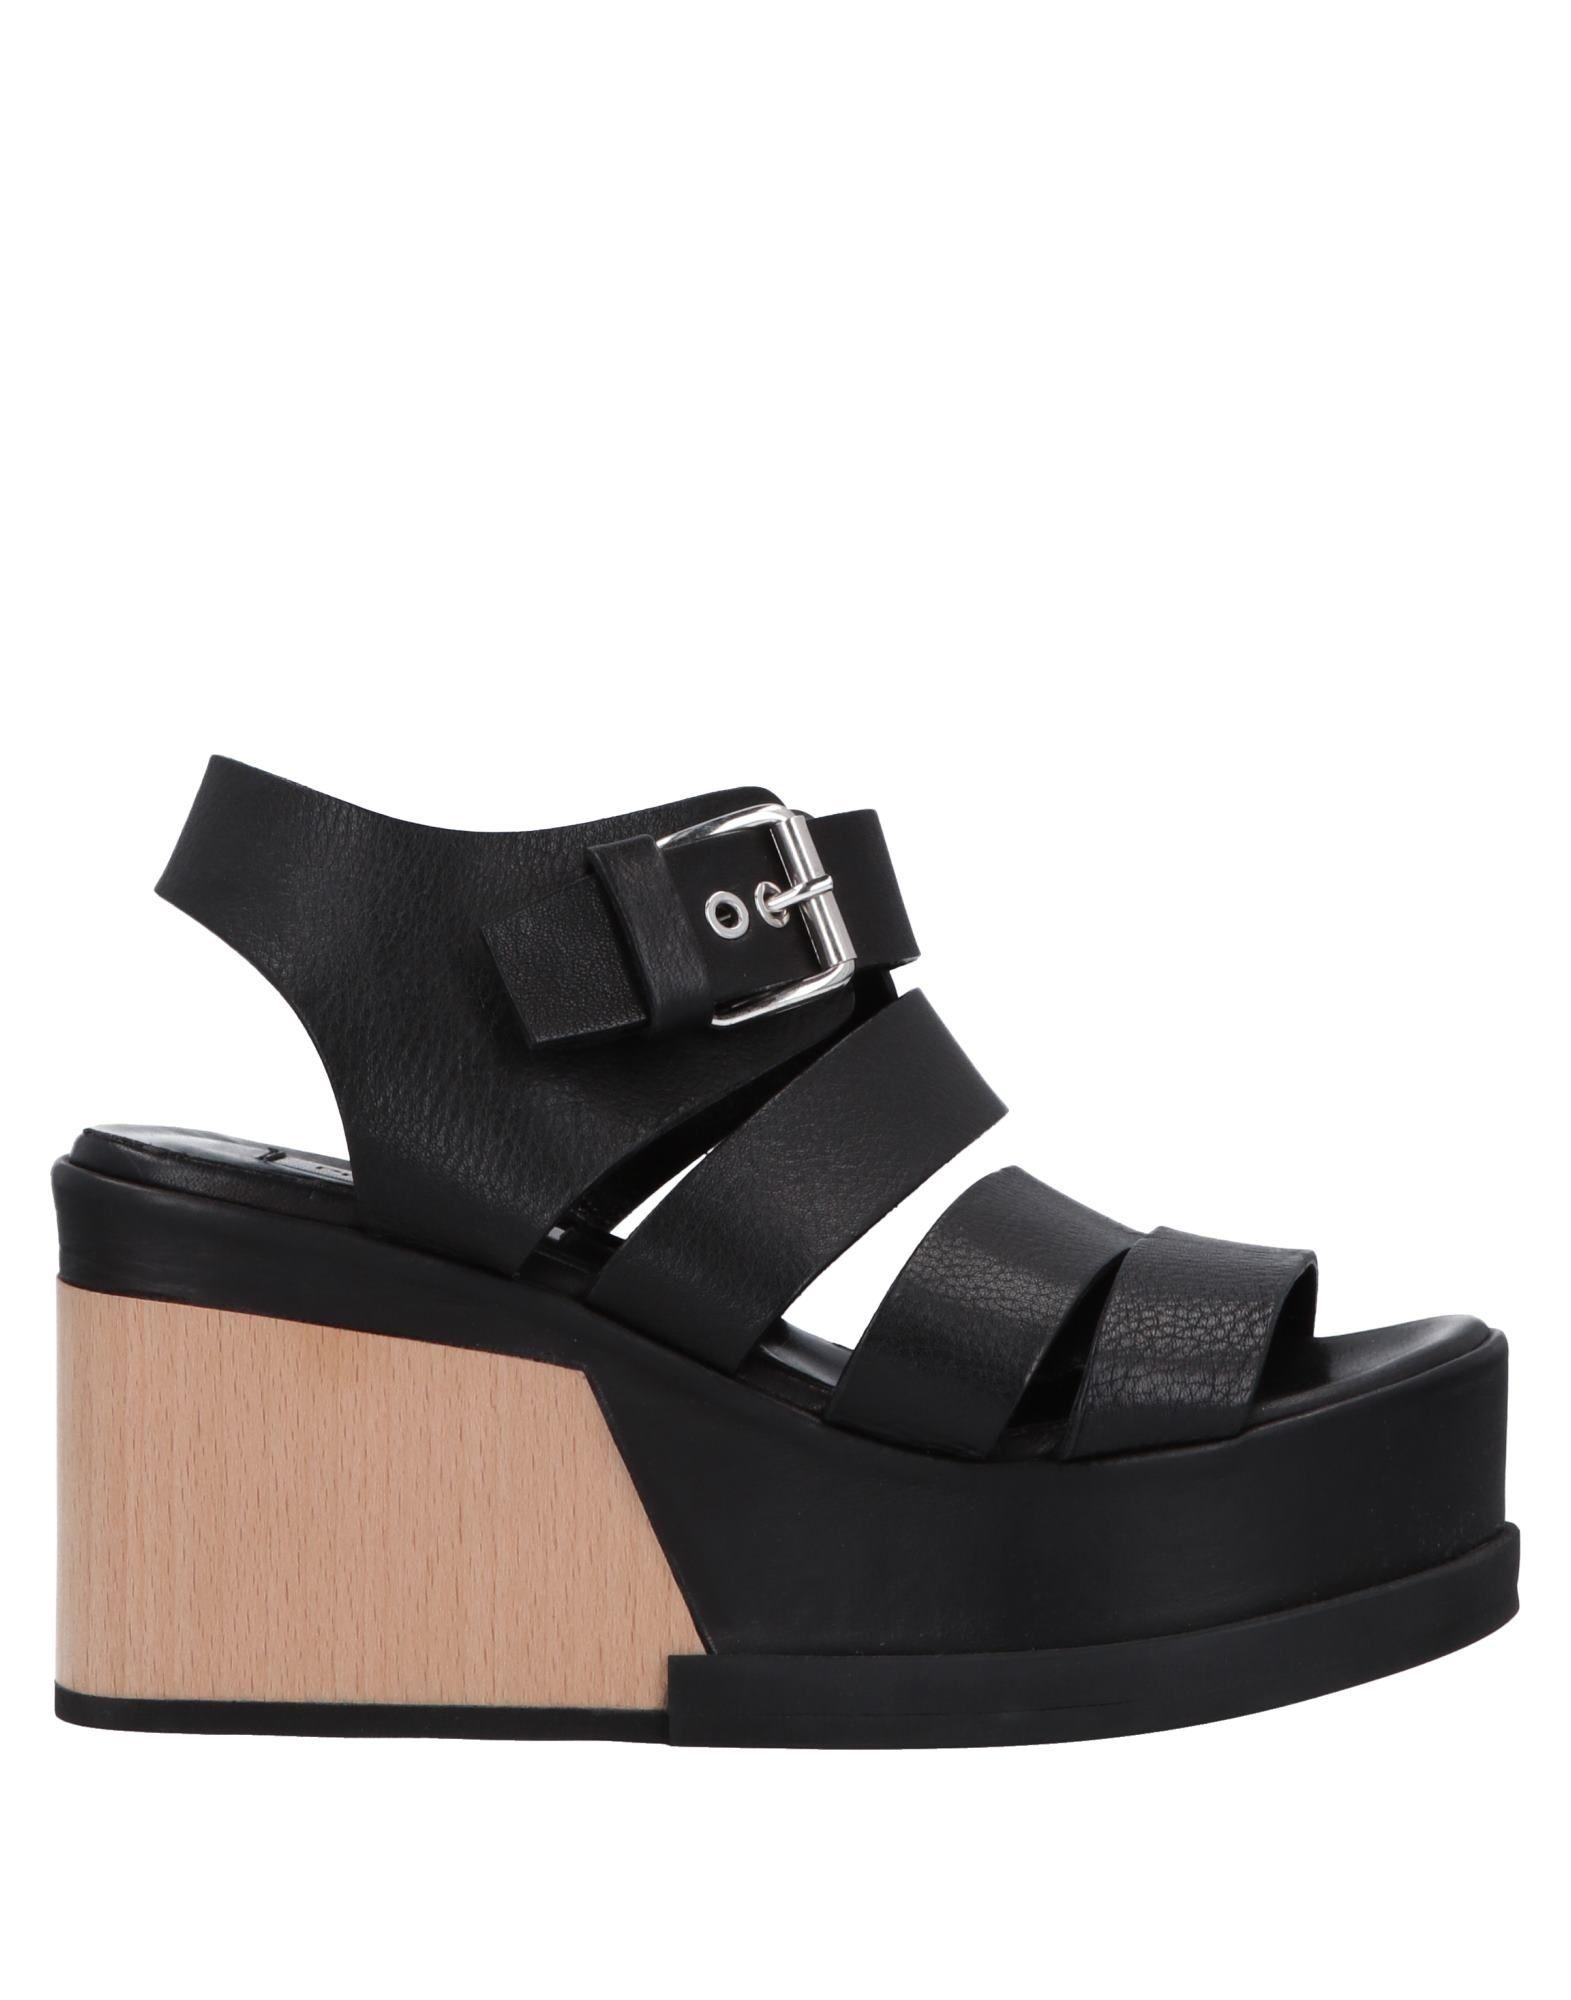 PEREGO SHOES Сандалии shoes and more сандалии